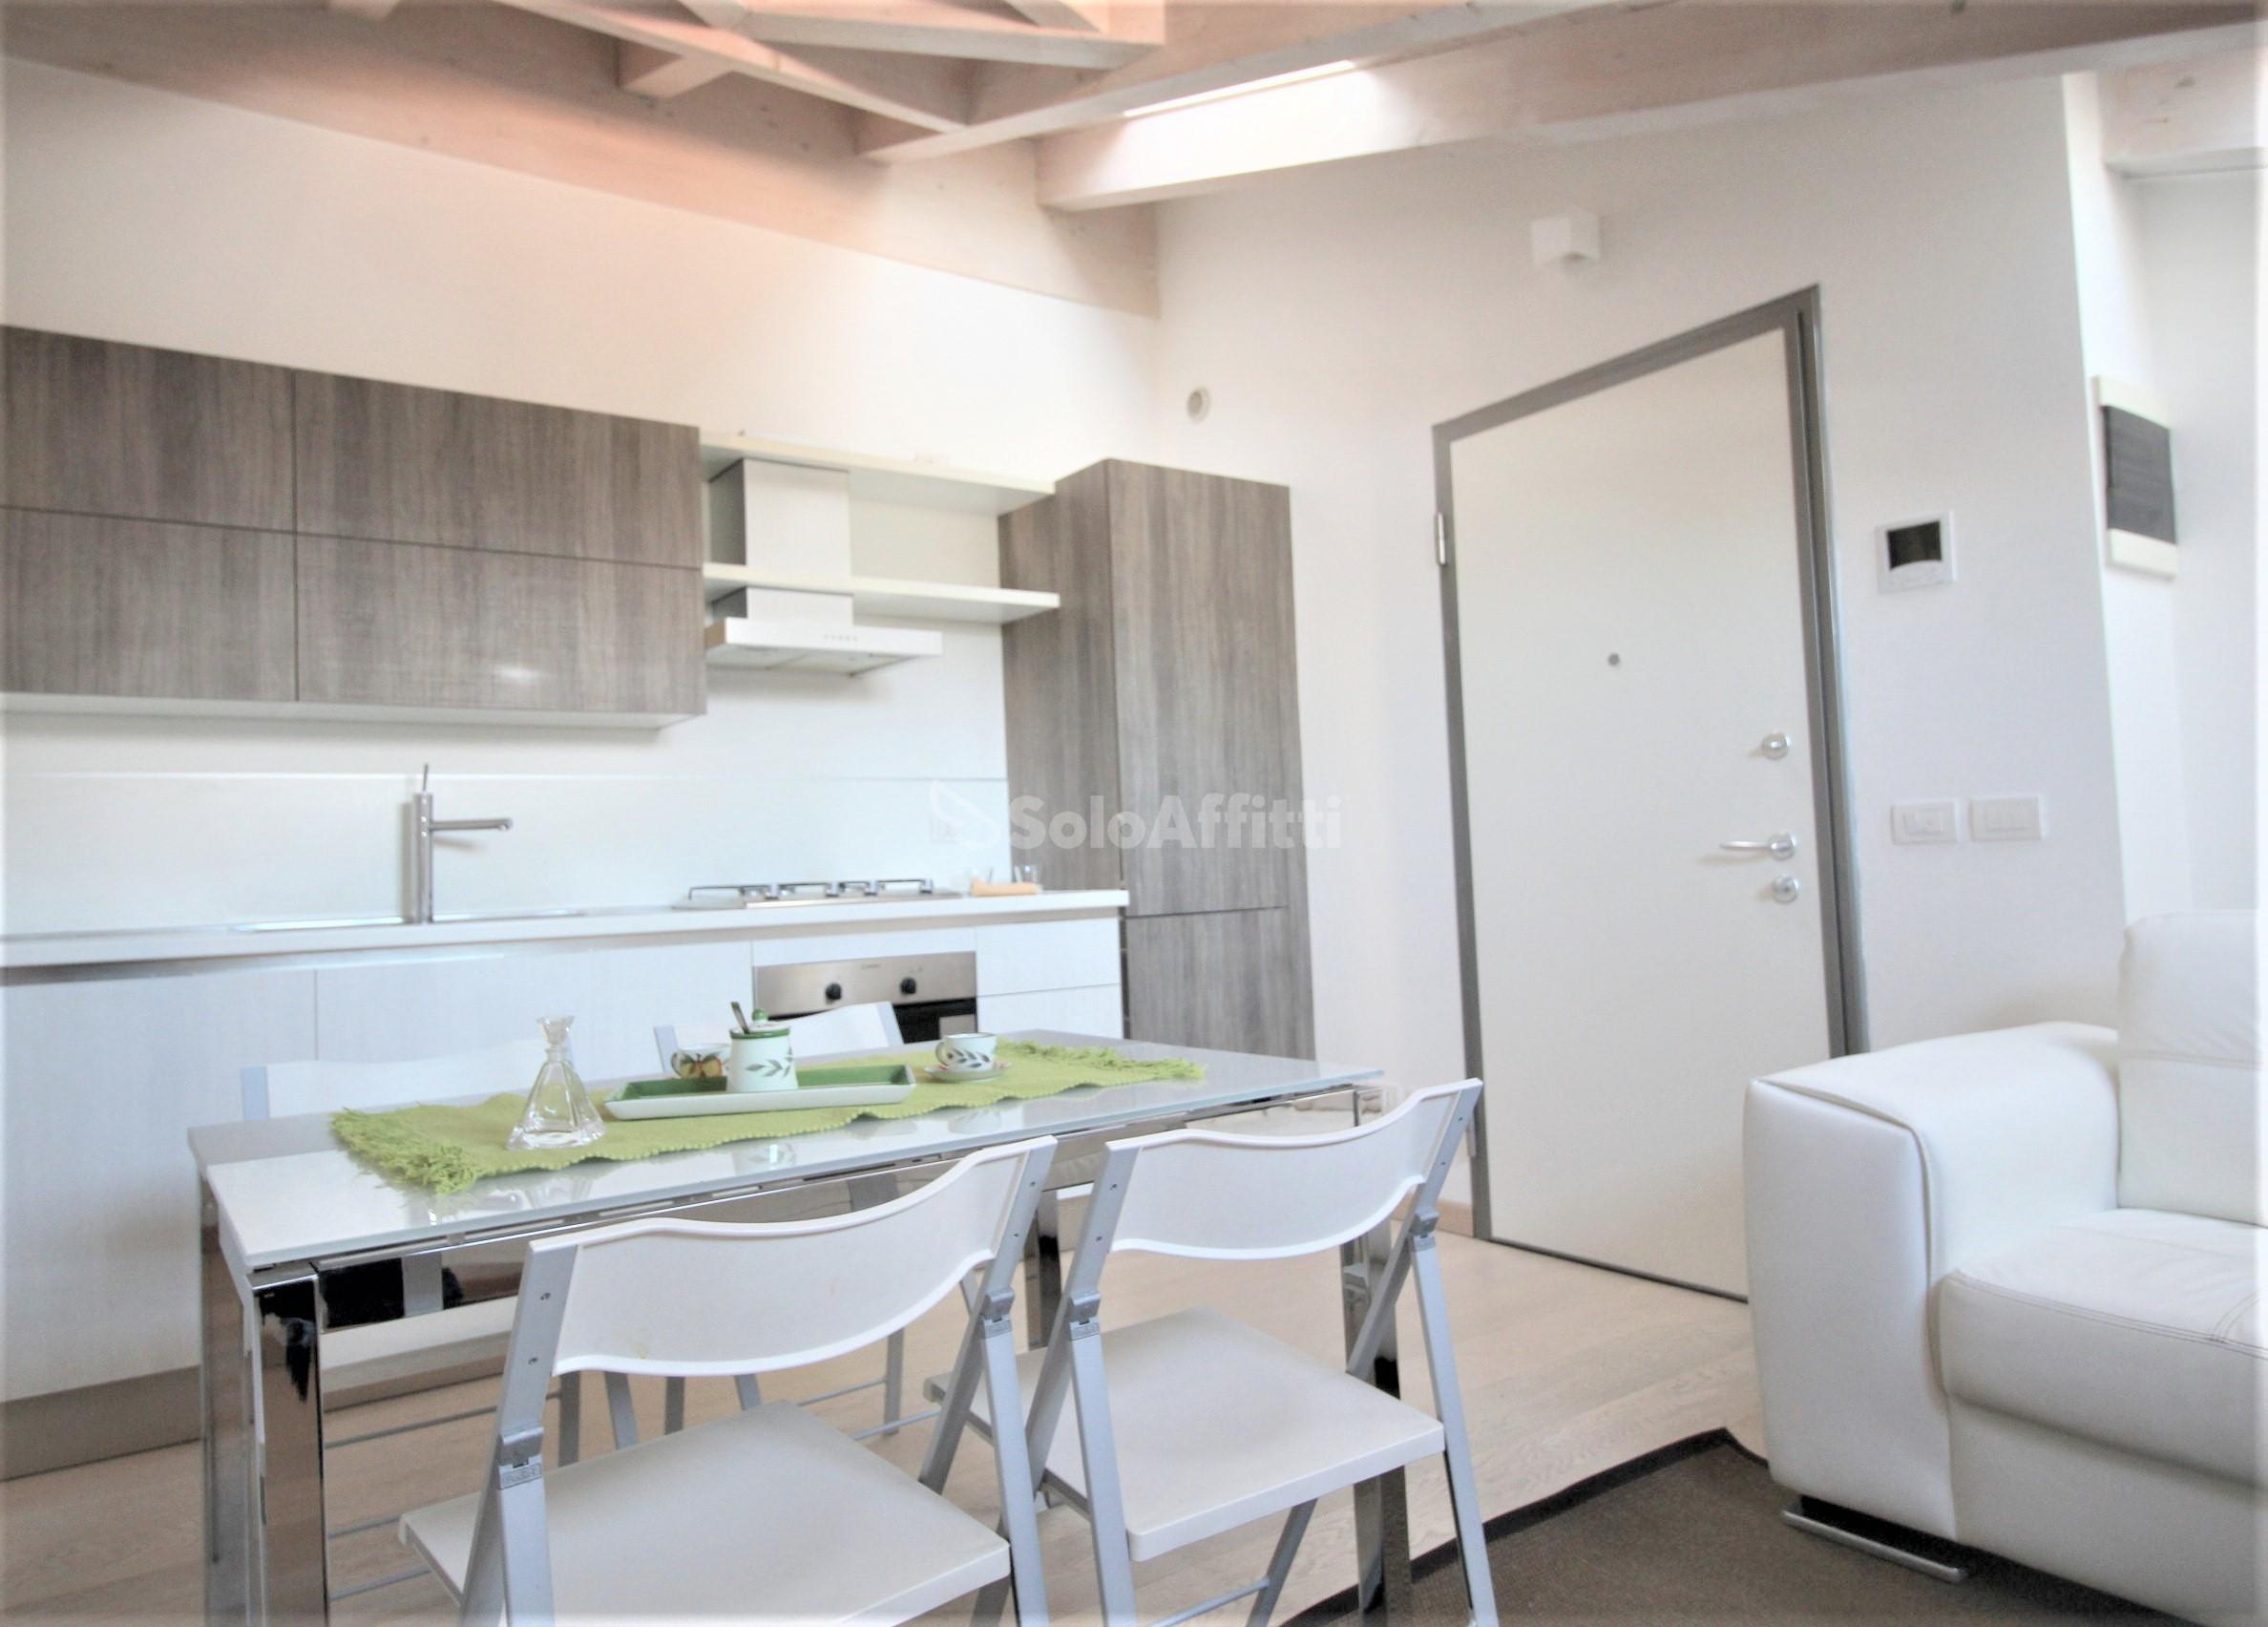 Appartamento Mansarda Arredato 47 mq.